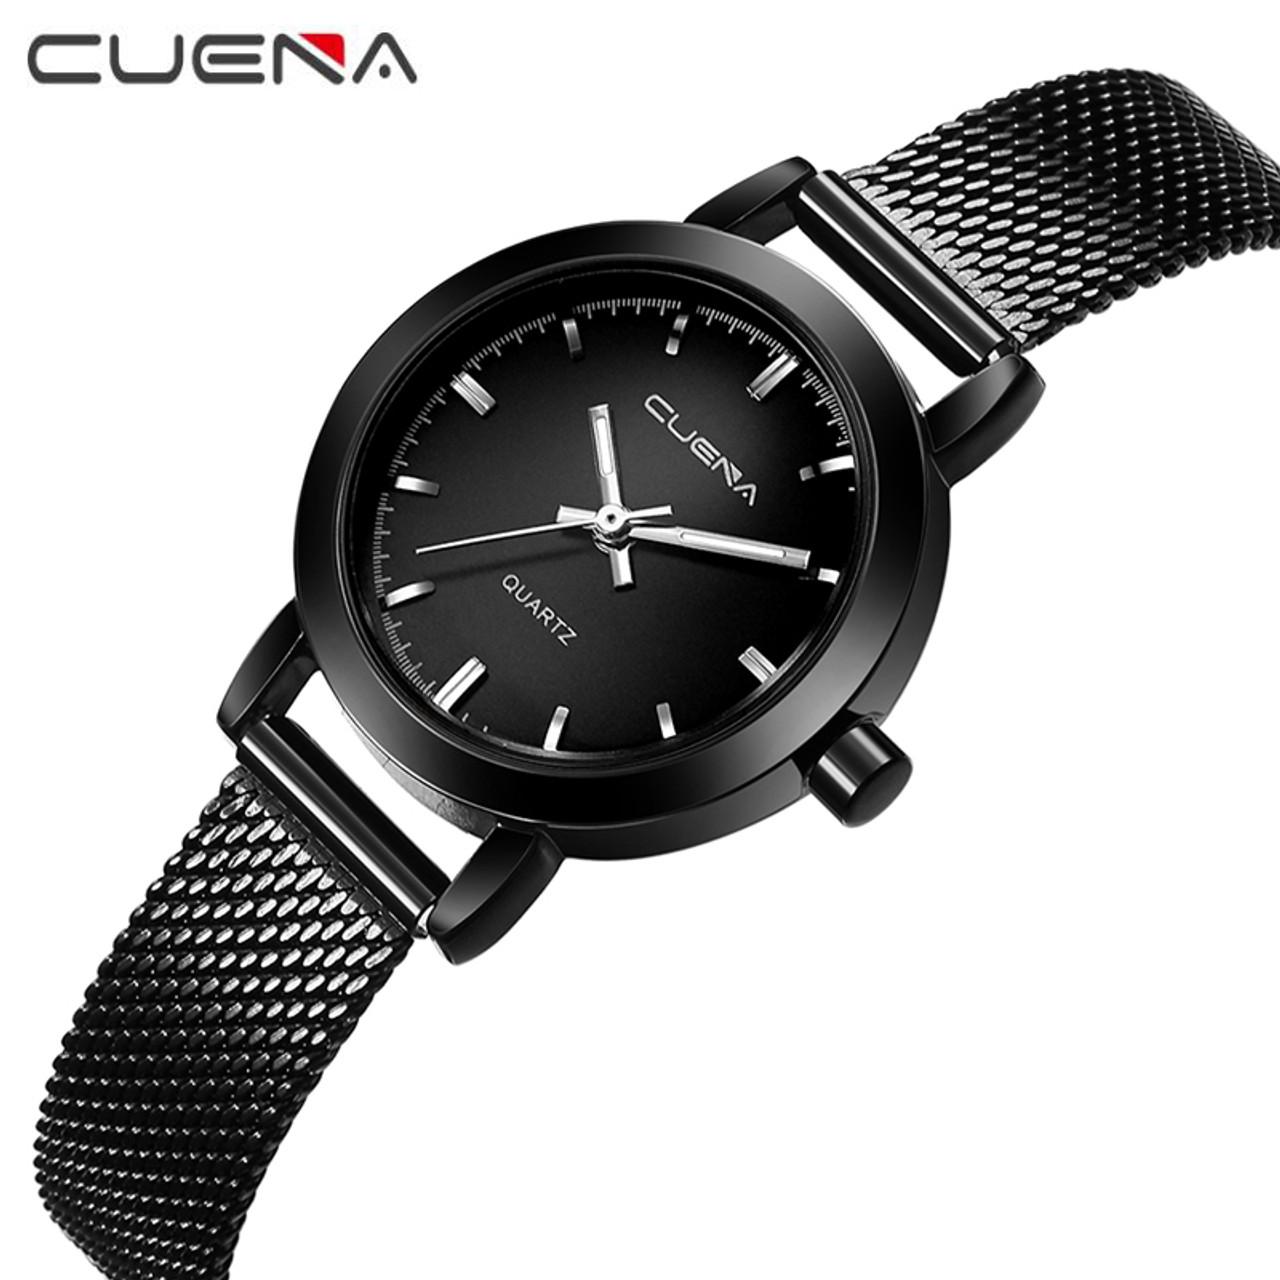 3dff04ad54f Luxury Women Quartz Watch Fashion Ladies Watches Relojes Reloj Mujer Montre  Femme Relogio Feminino CUENA Brand 6627G 6 Colors - OnshopDeals.Com